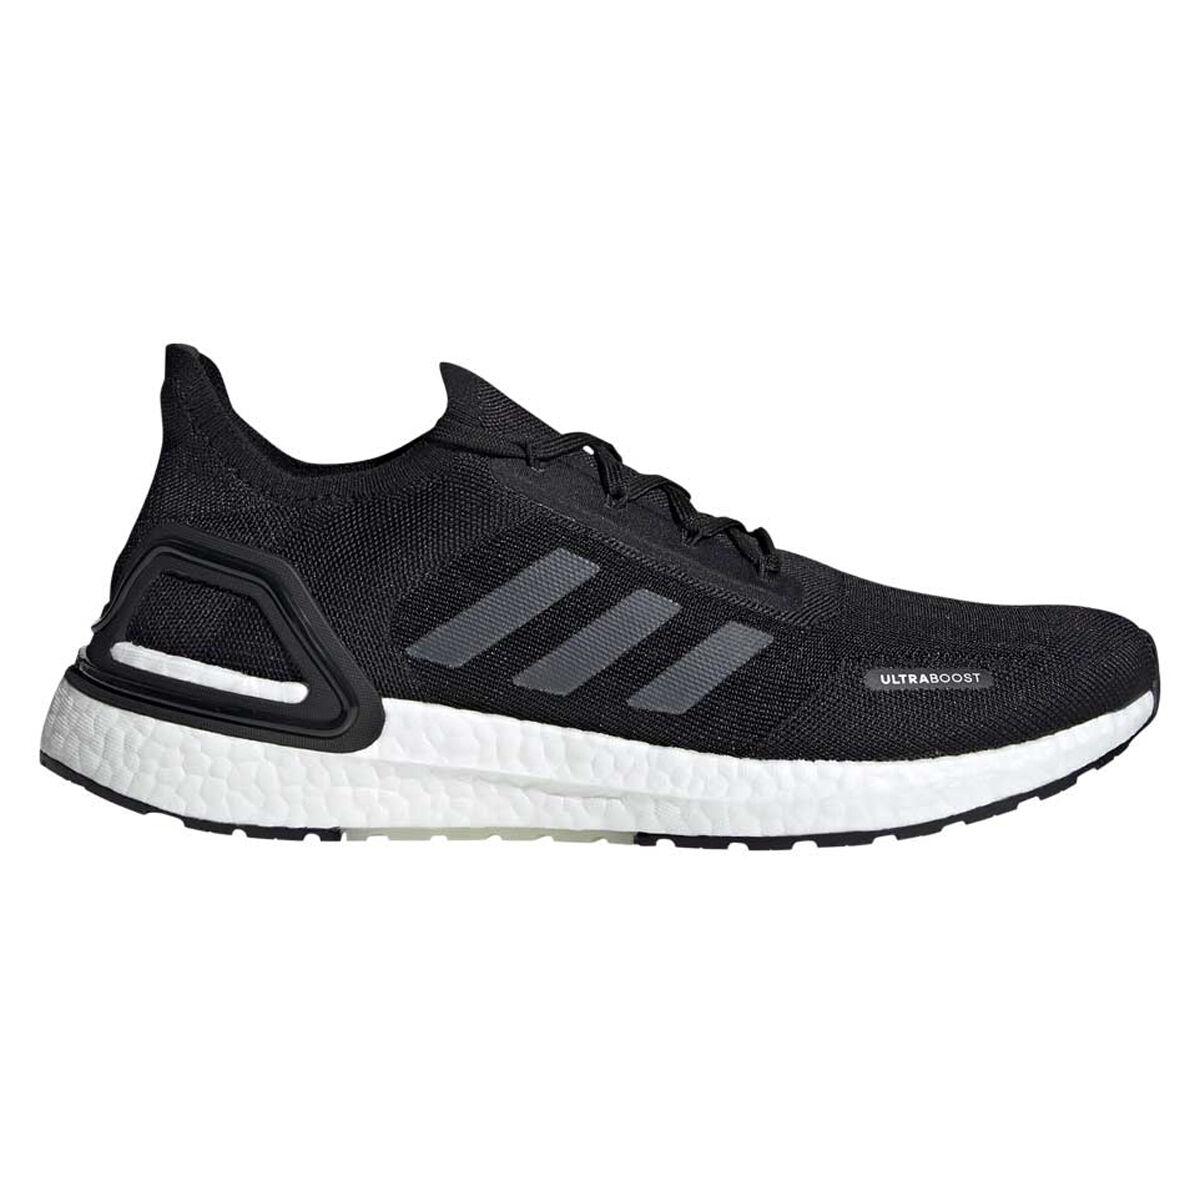 Nike Free Run 2, blackwhite, size UK 10. 810 Depop